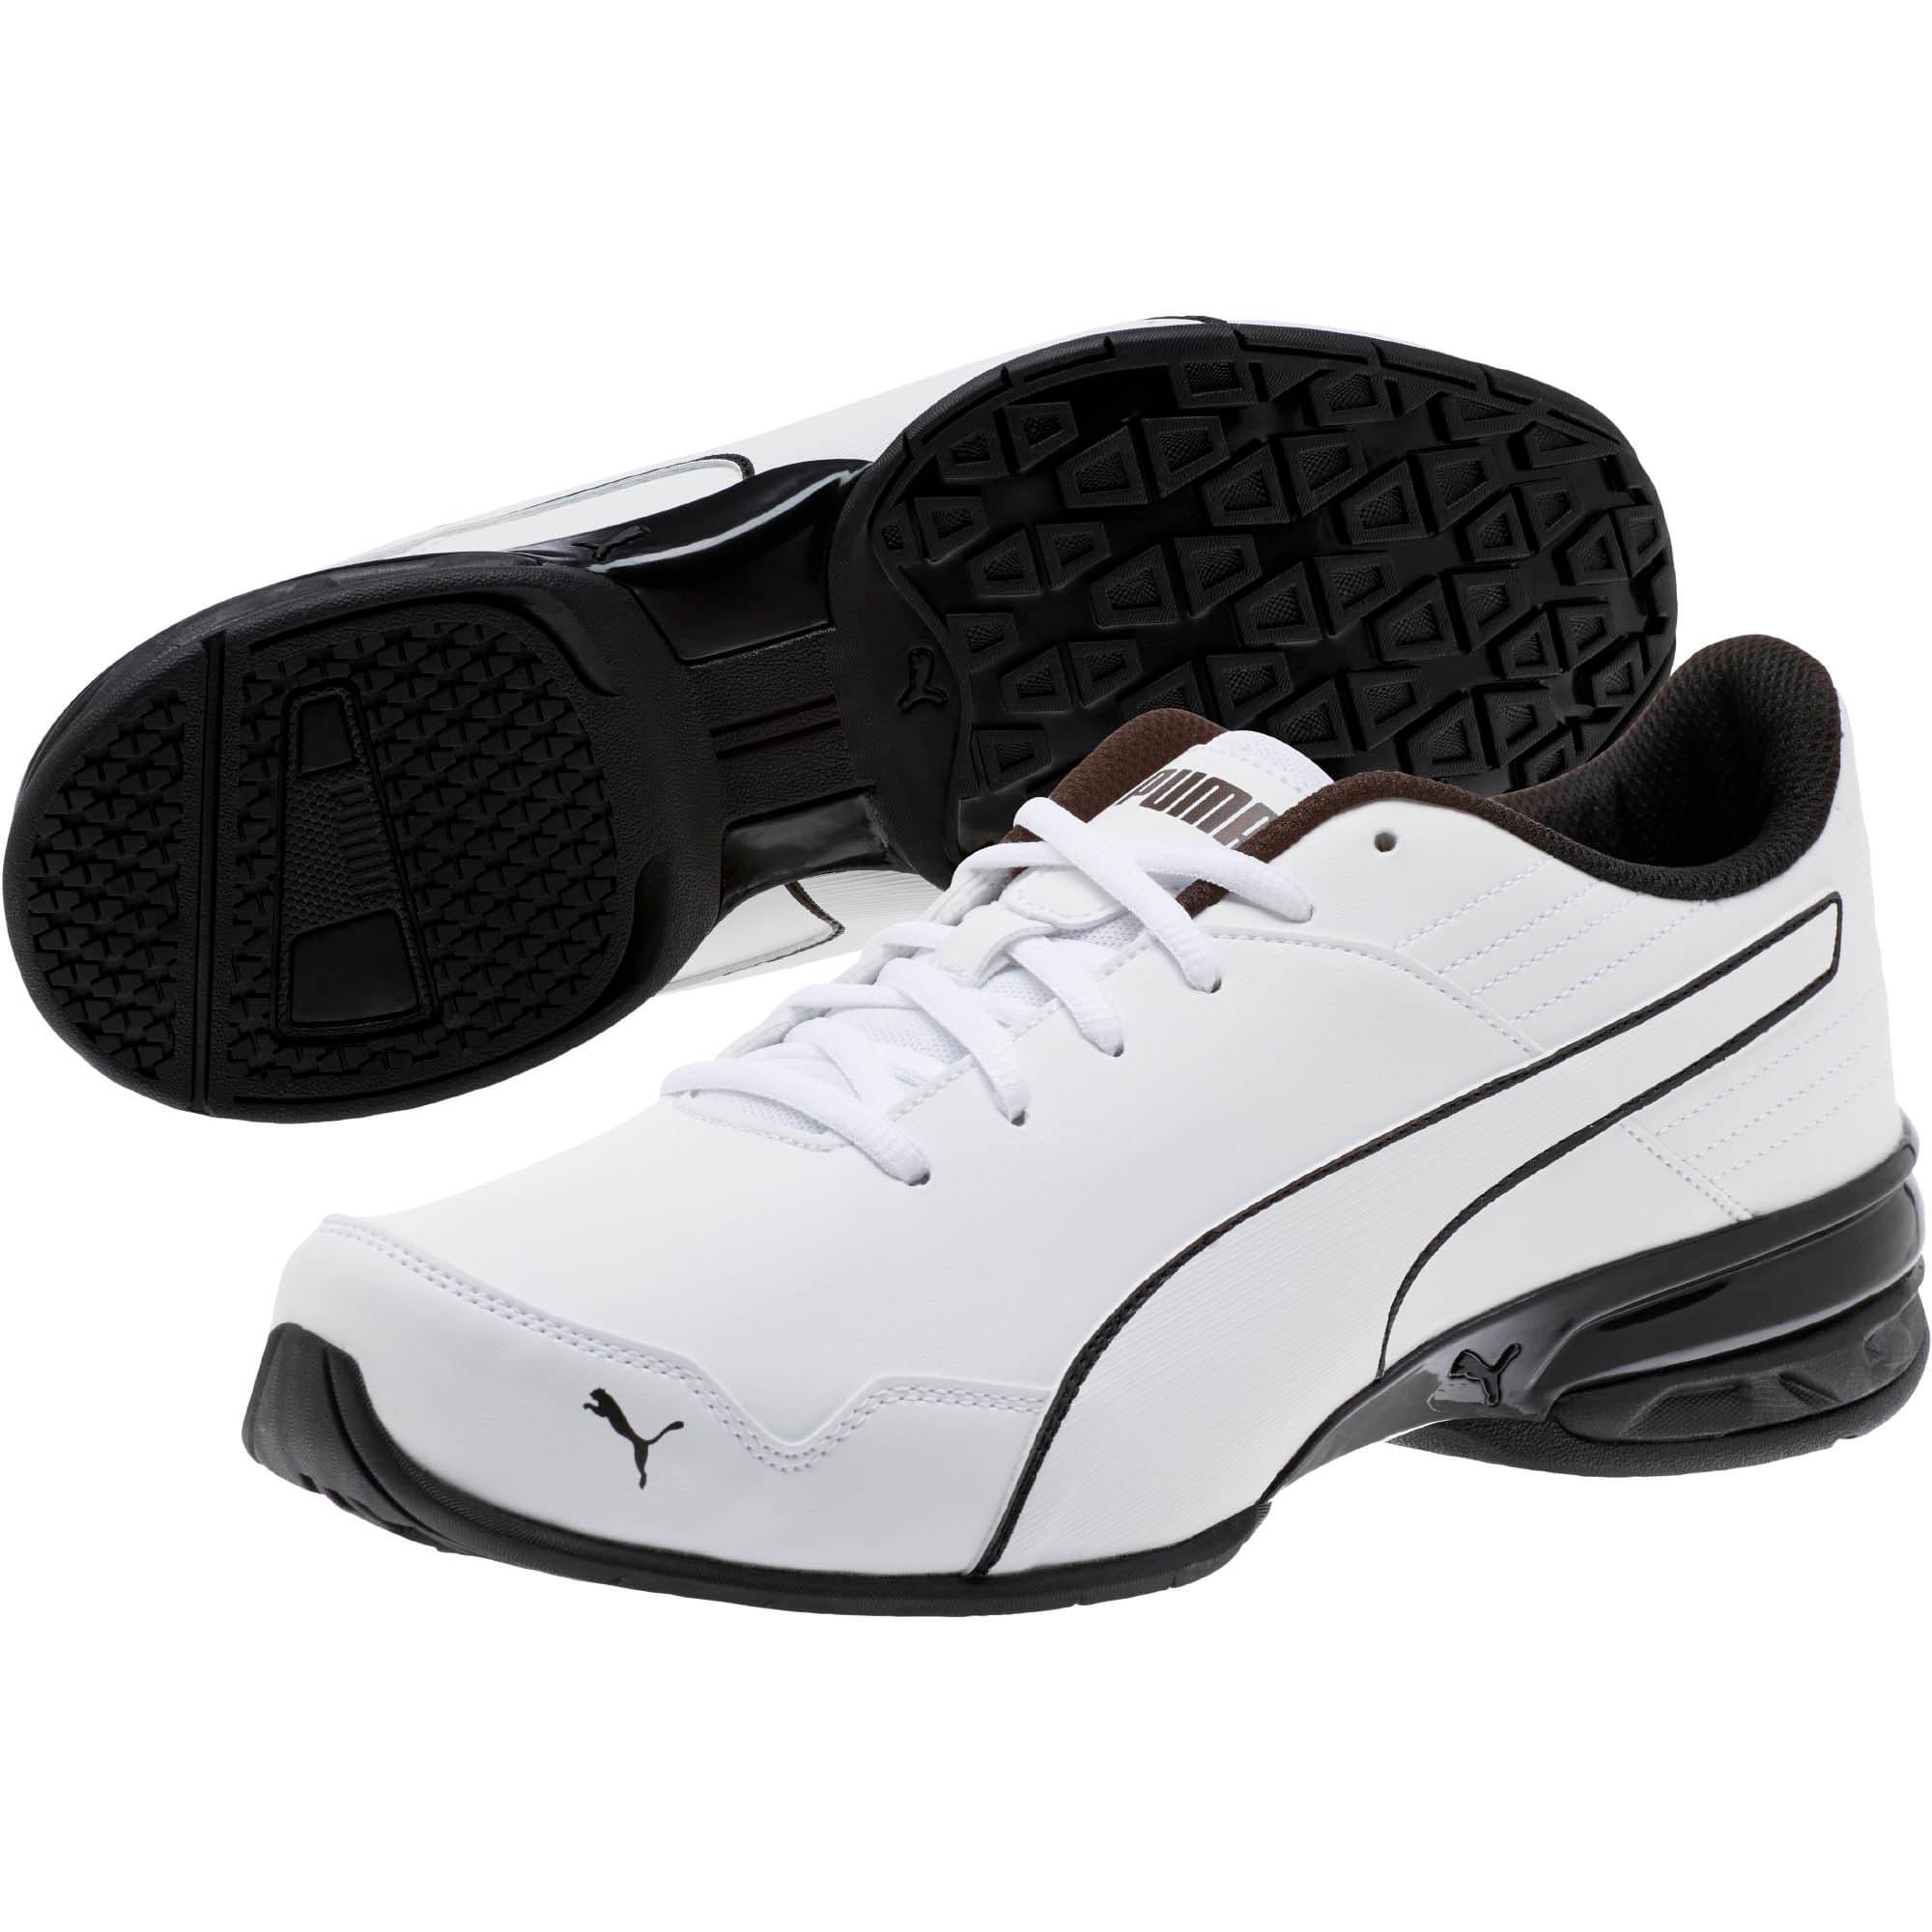 Thumbnail 2 of Super Levitate Men's Running Shoes, Puma White-Puma Black, medium